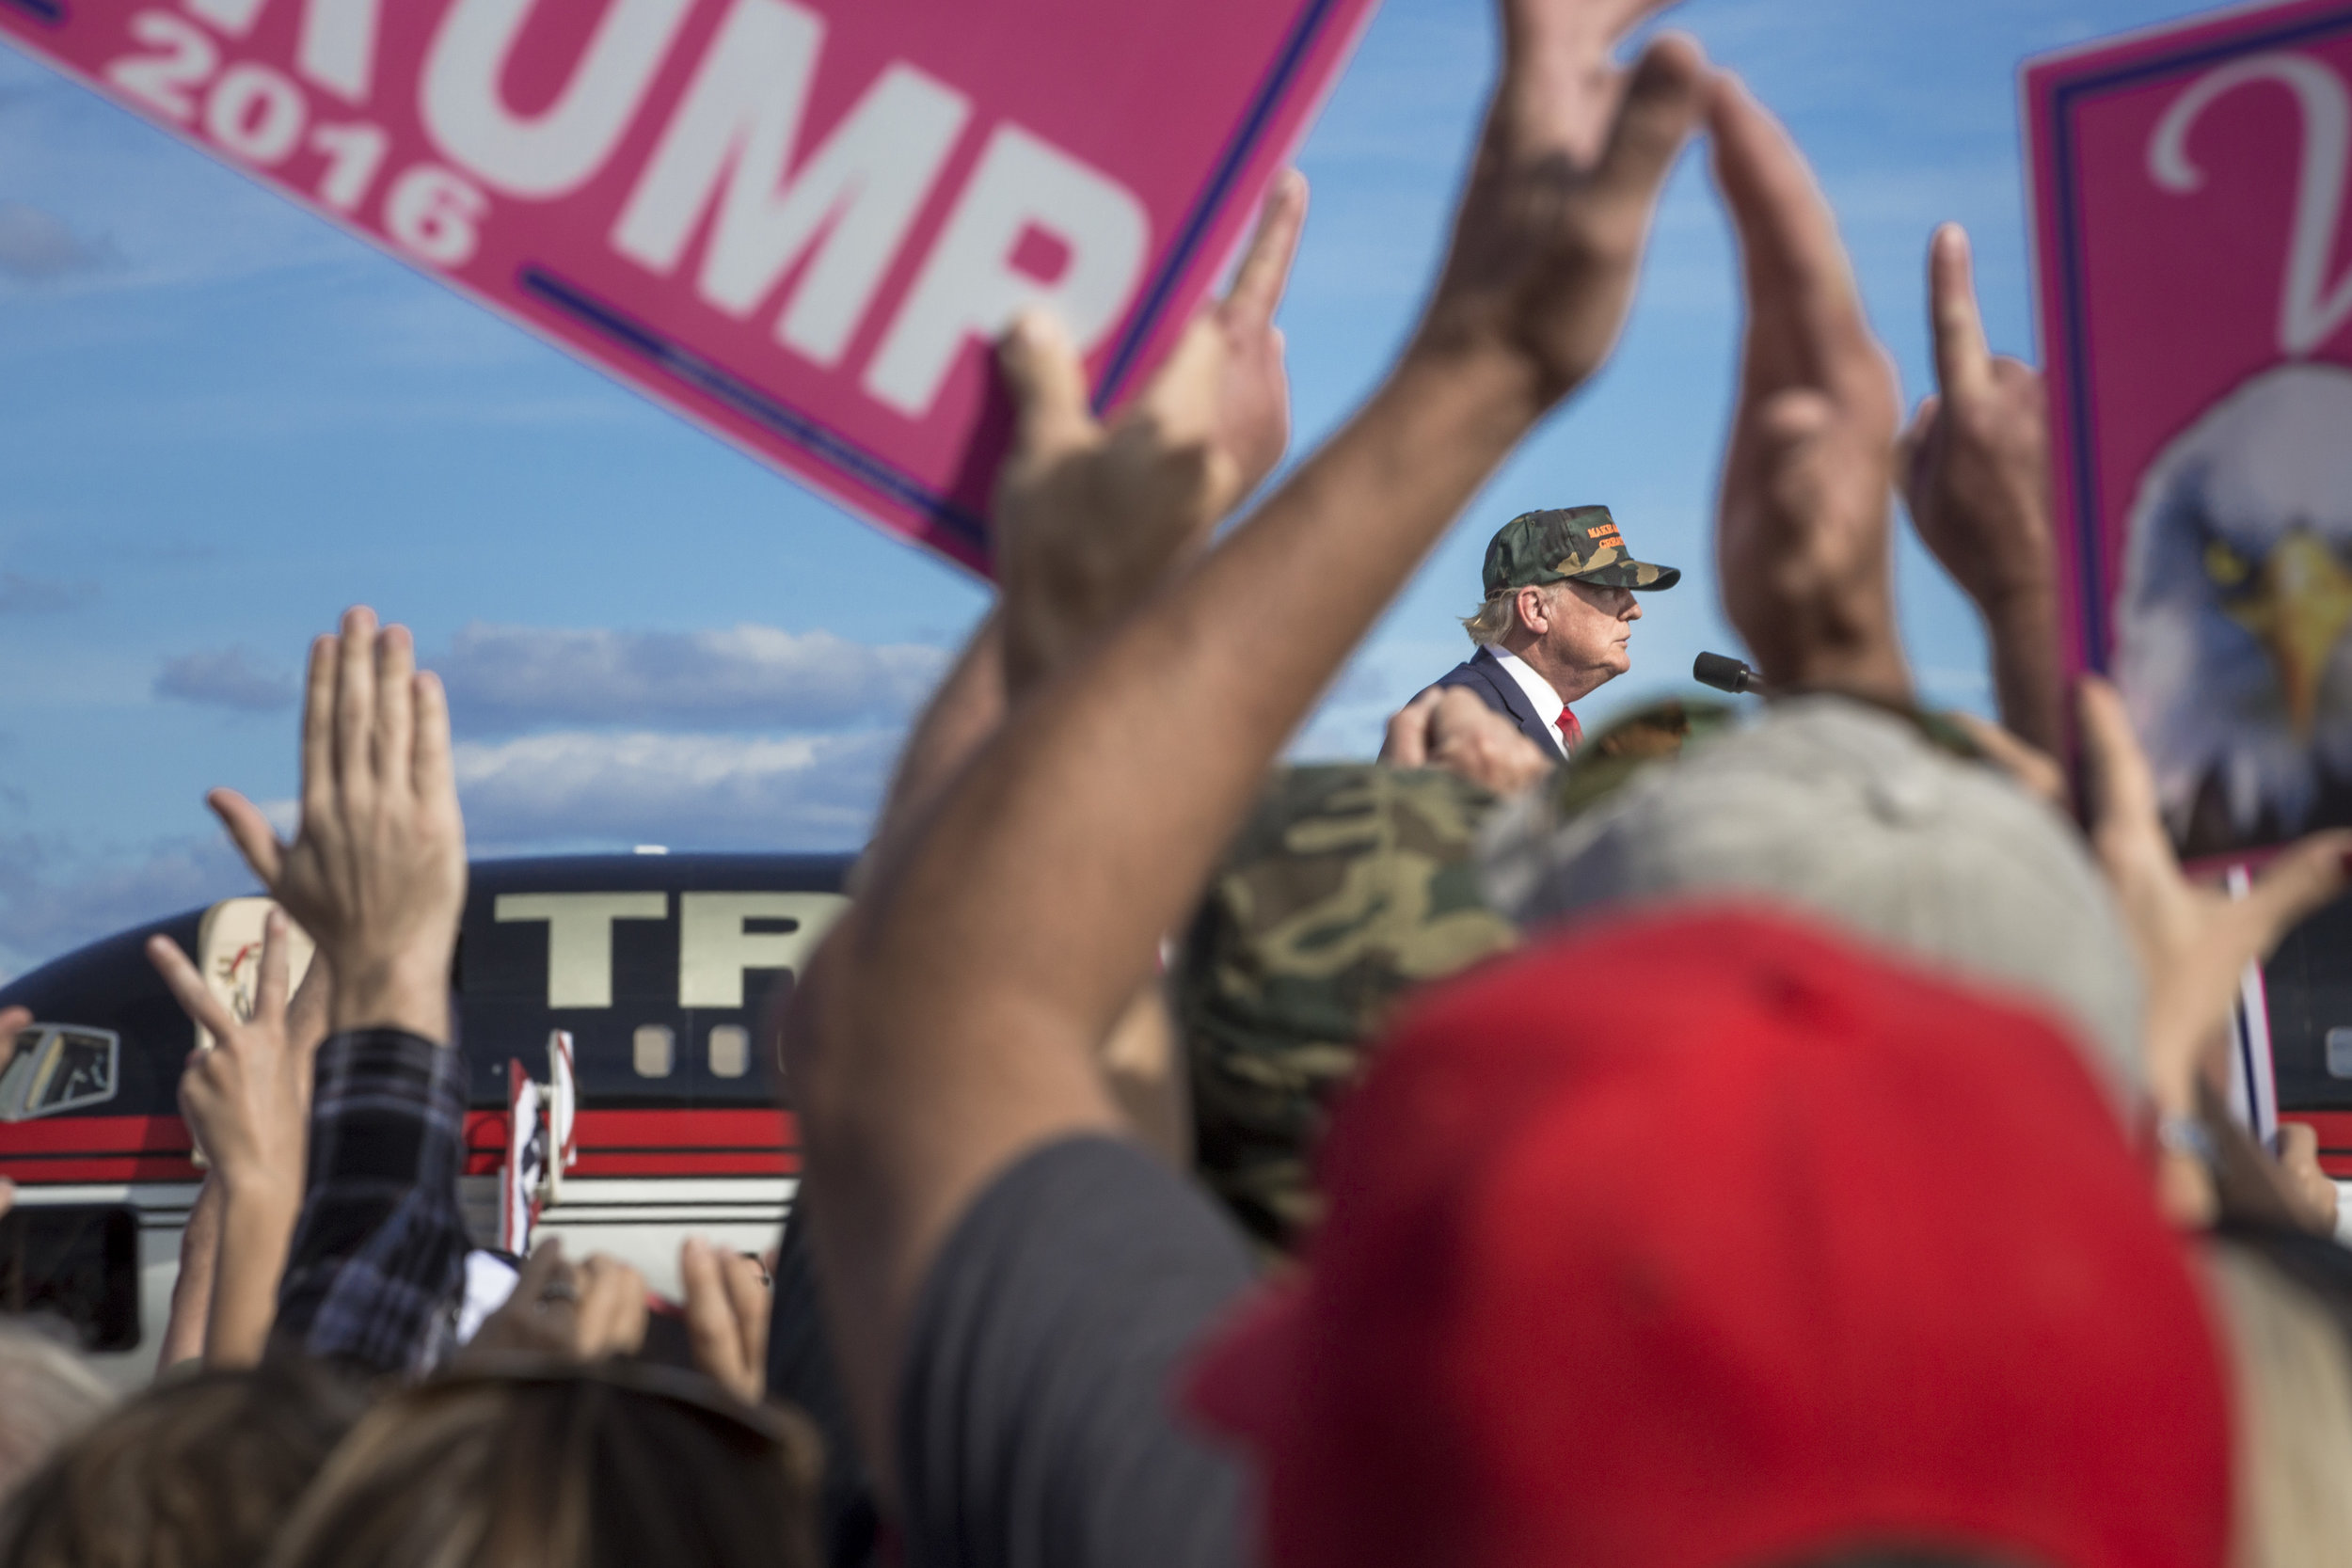 10252016_BJM_Donald_Trump_Campaigns_in_Sanford_Florida_06.jpg